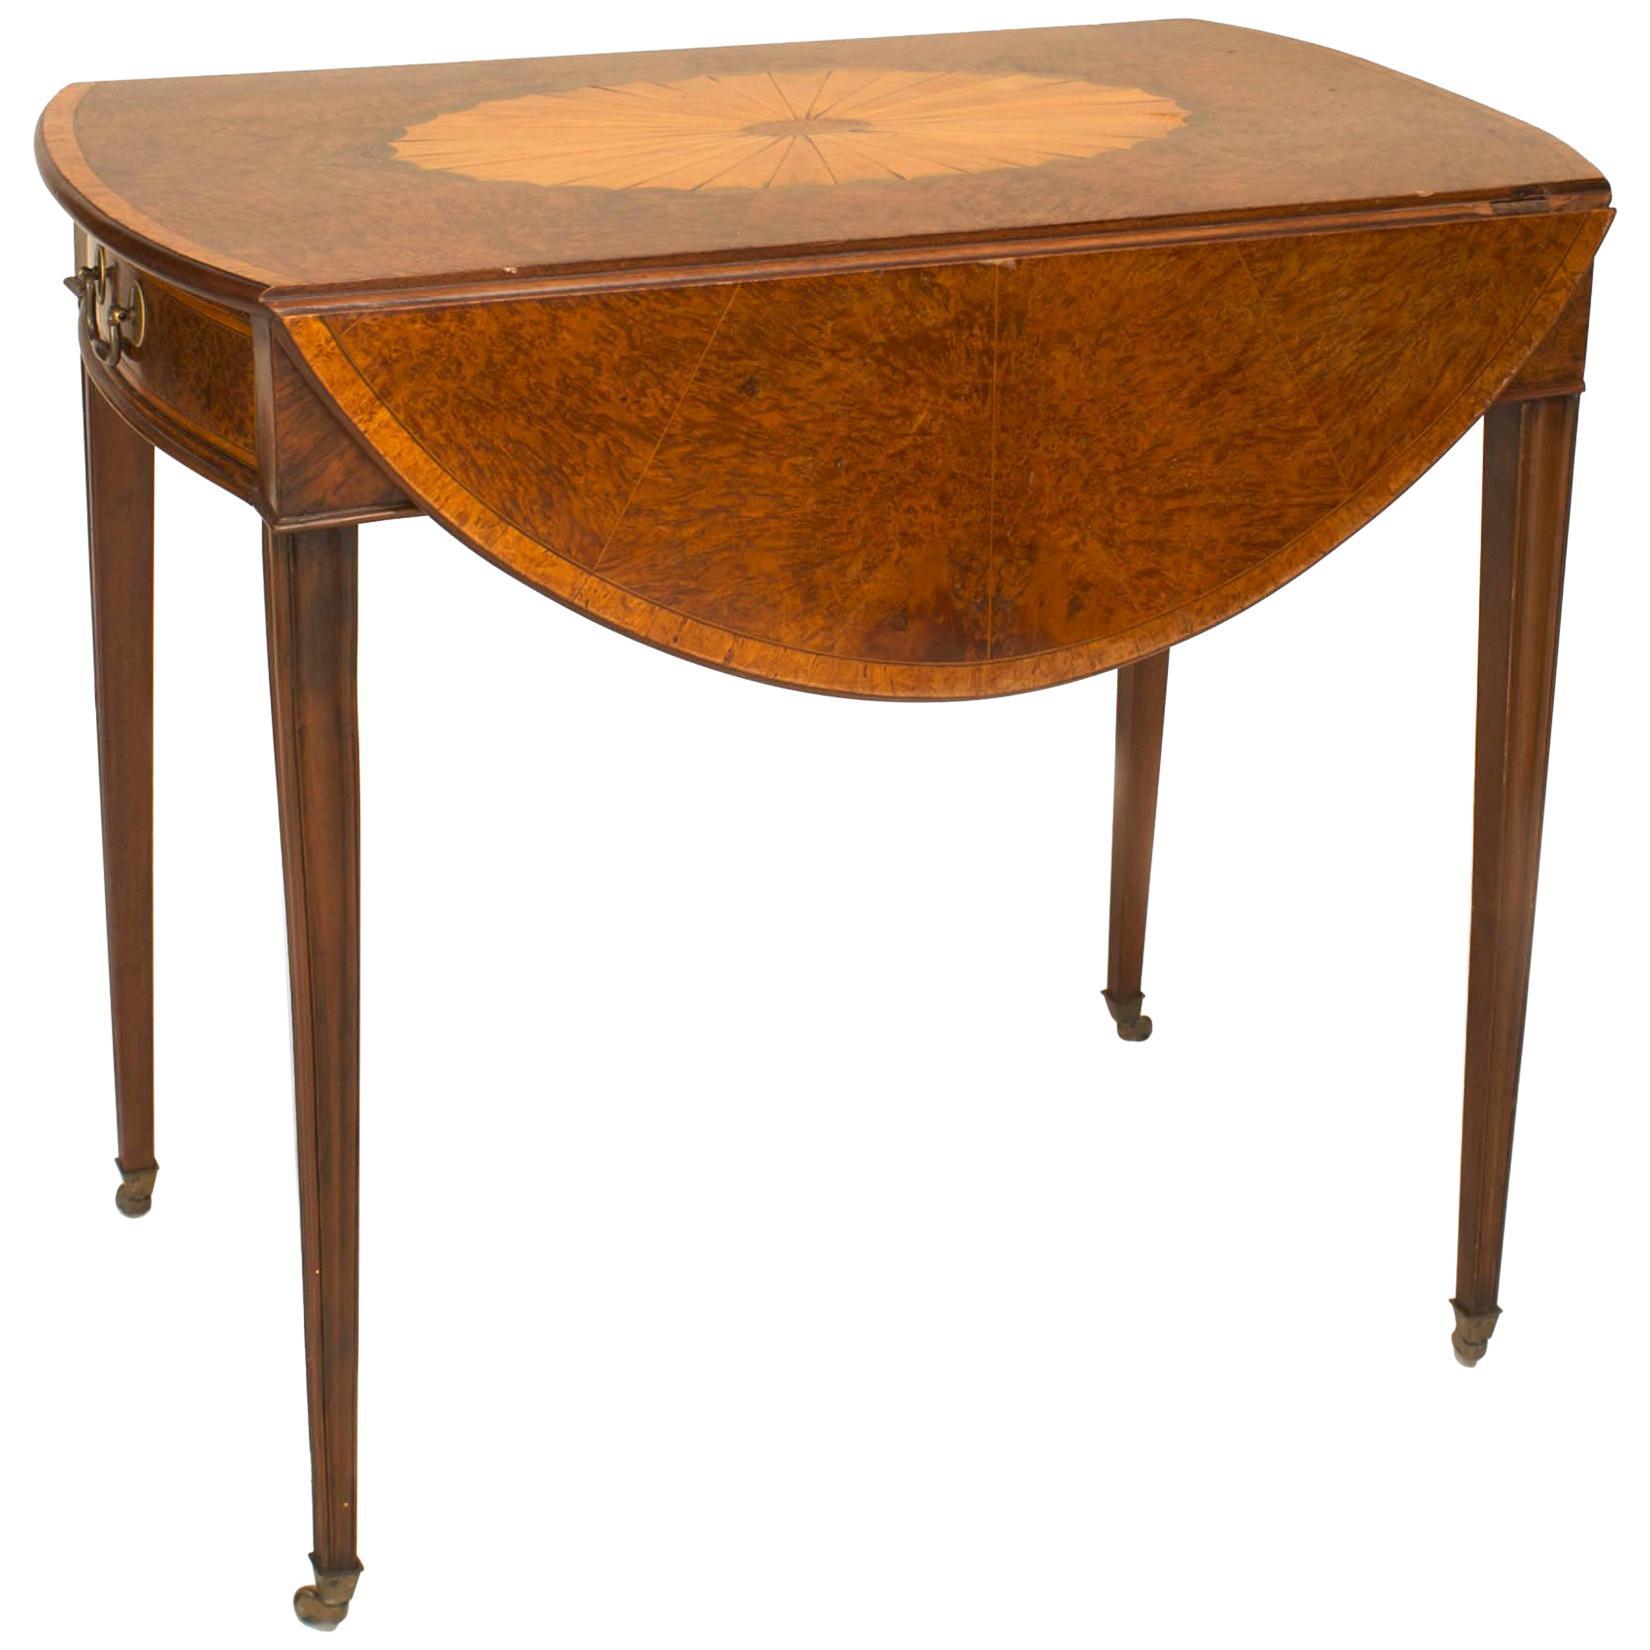 English Georgian Burl Wood Pembroke Table, 18th Century